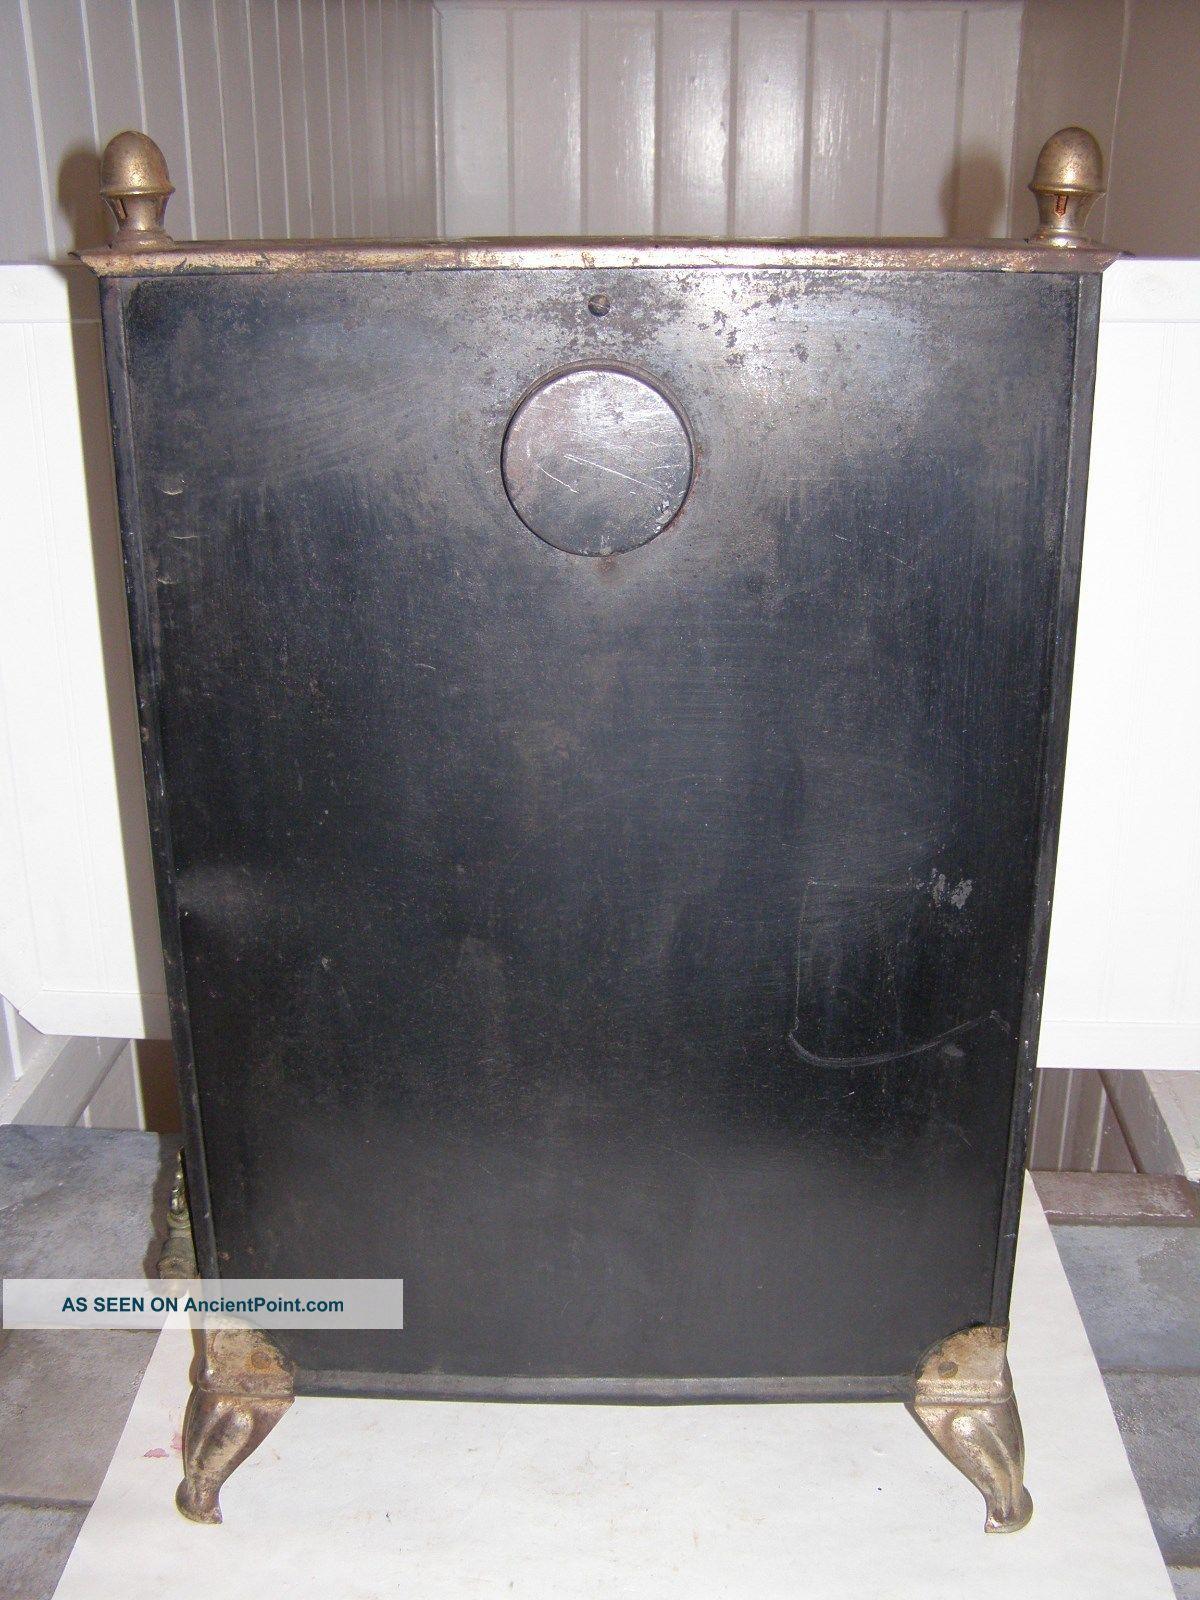 Vintage Beauty Radiant Parlor Natural Gas Radiant Heater